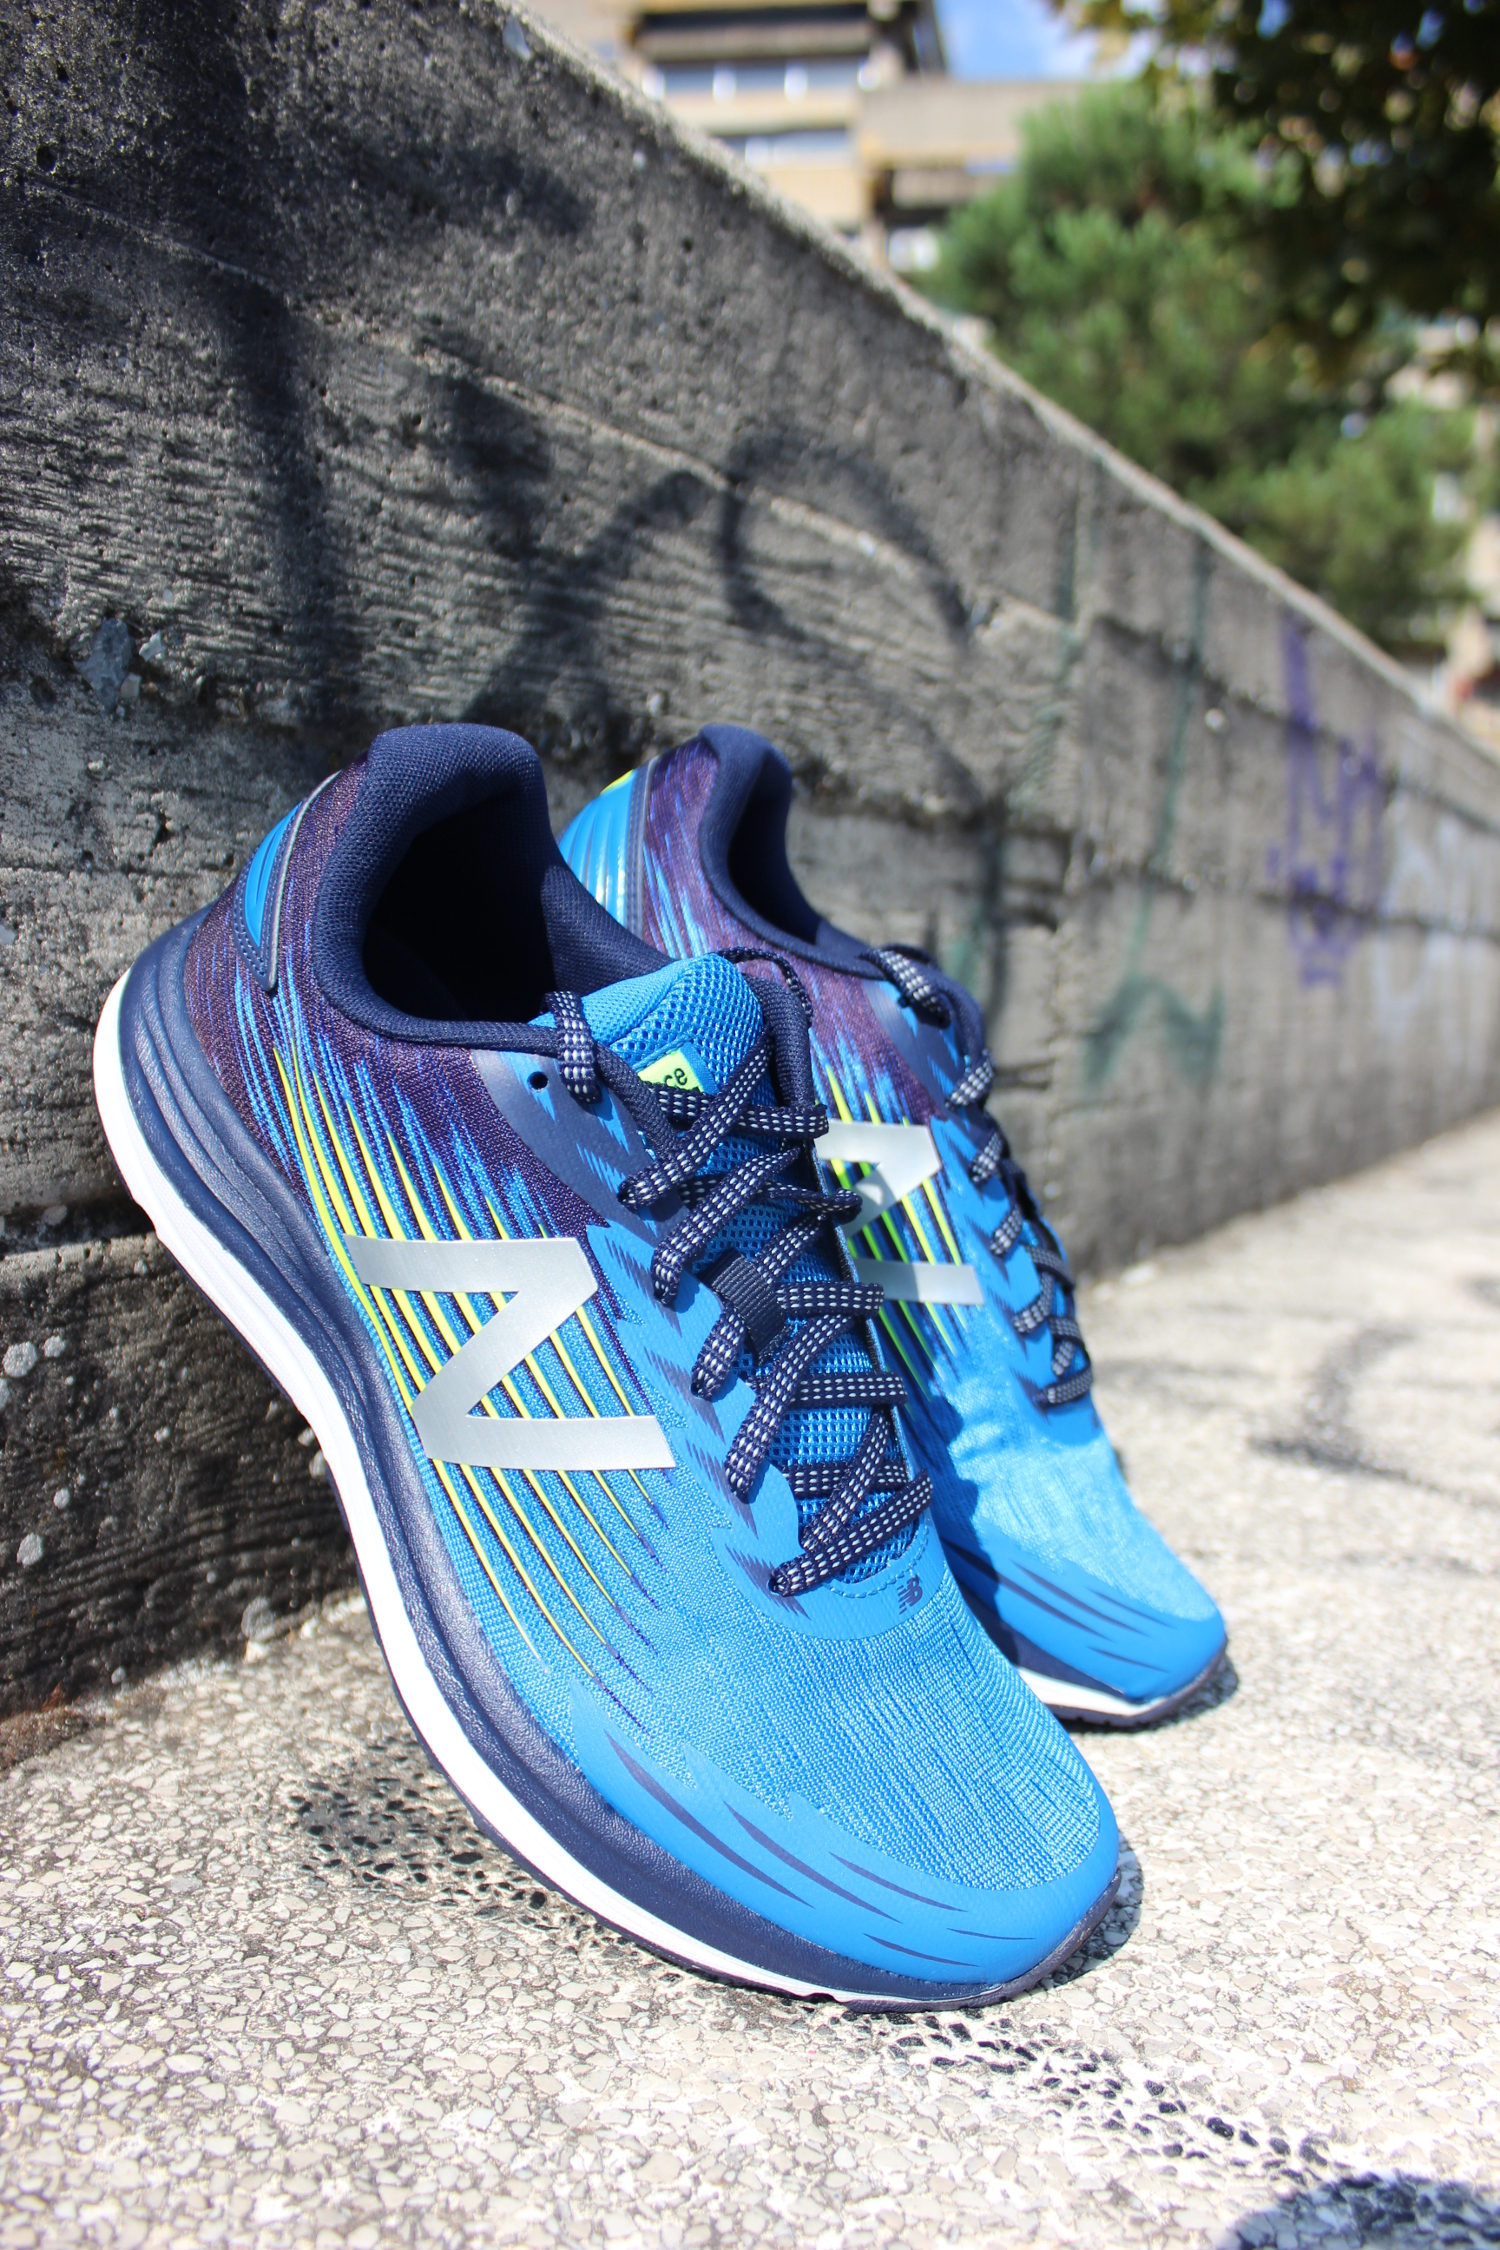 course Chaussures Baskets Chaussures course Synact Balance Blue Baskets New de Man de YqwTTU